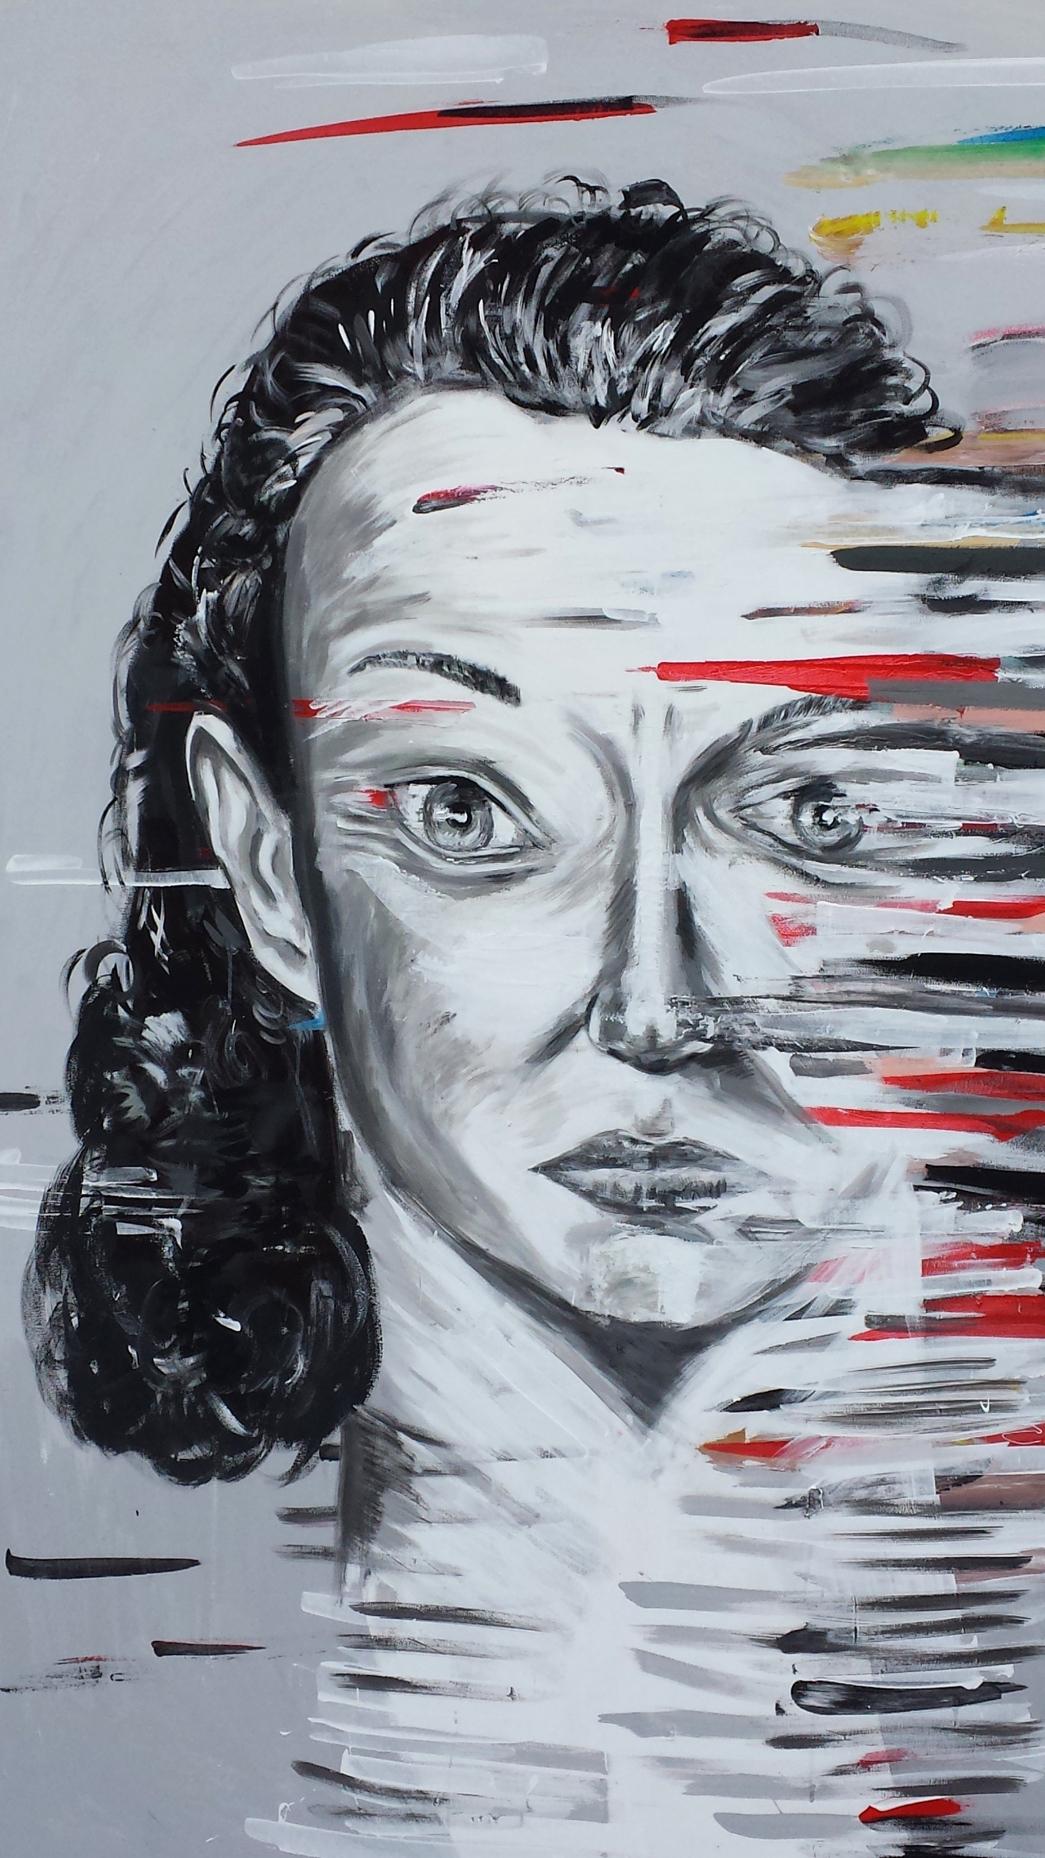 Alkoholikerin, Acryll auf Nessel, 180 x 140 cm, 2014